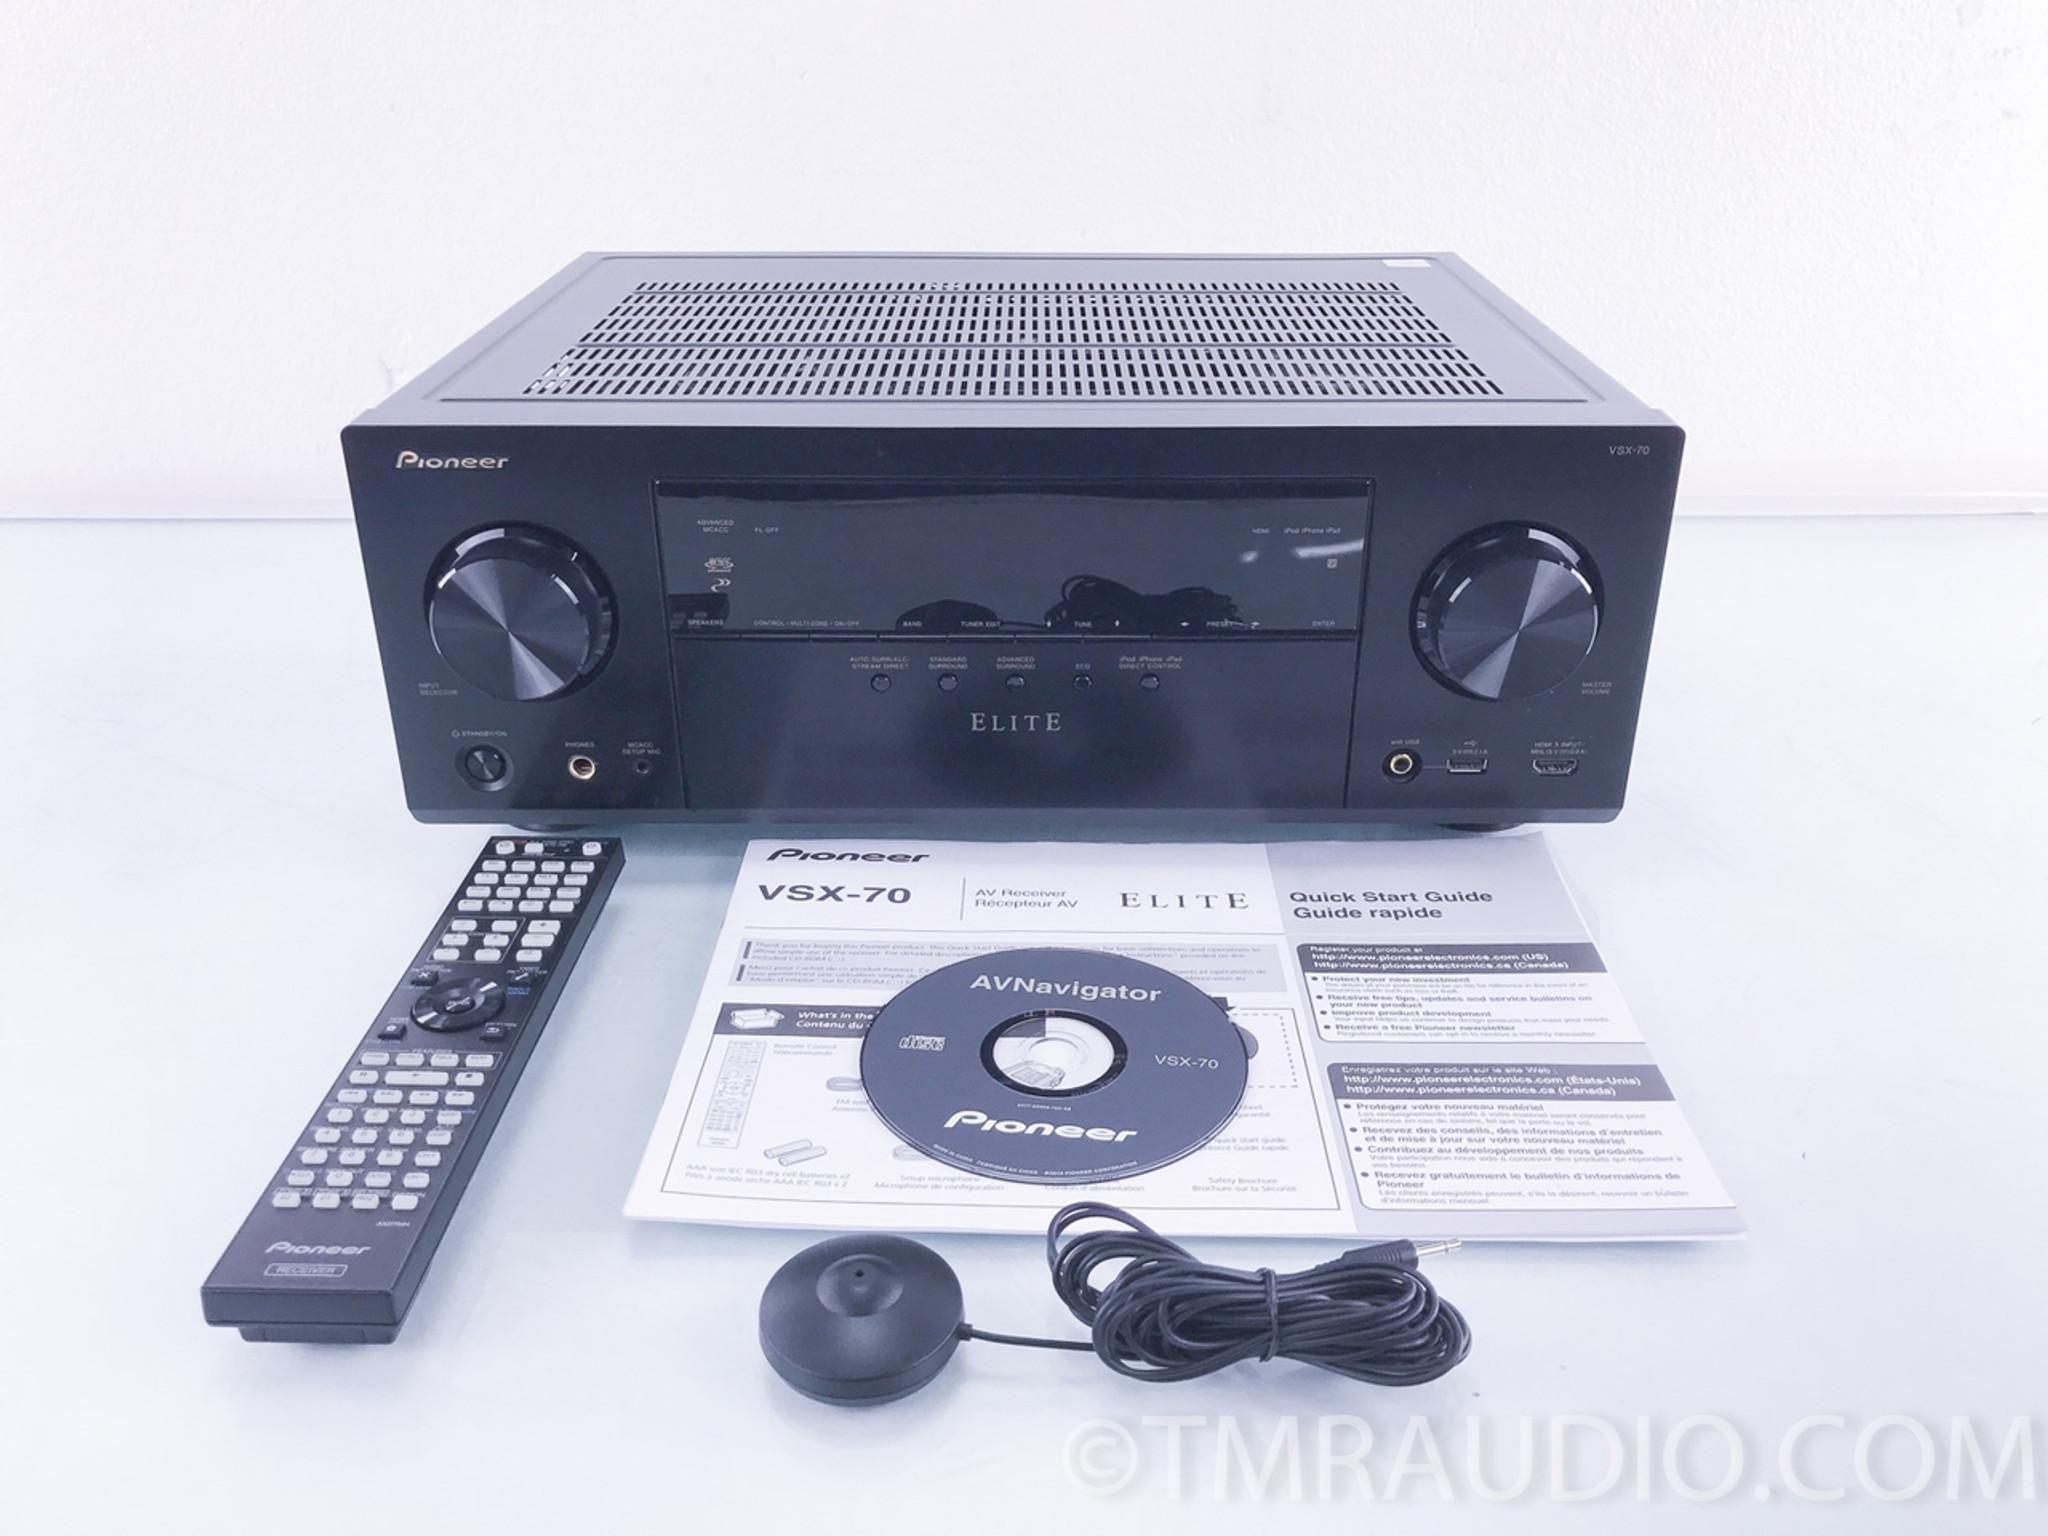 pioneer elite vsx 70 home theater receiver the music room rh tmraudio com pioneer elite vsx-70 manual Pioneer Receiver VSX -43